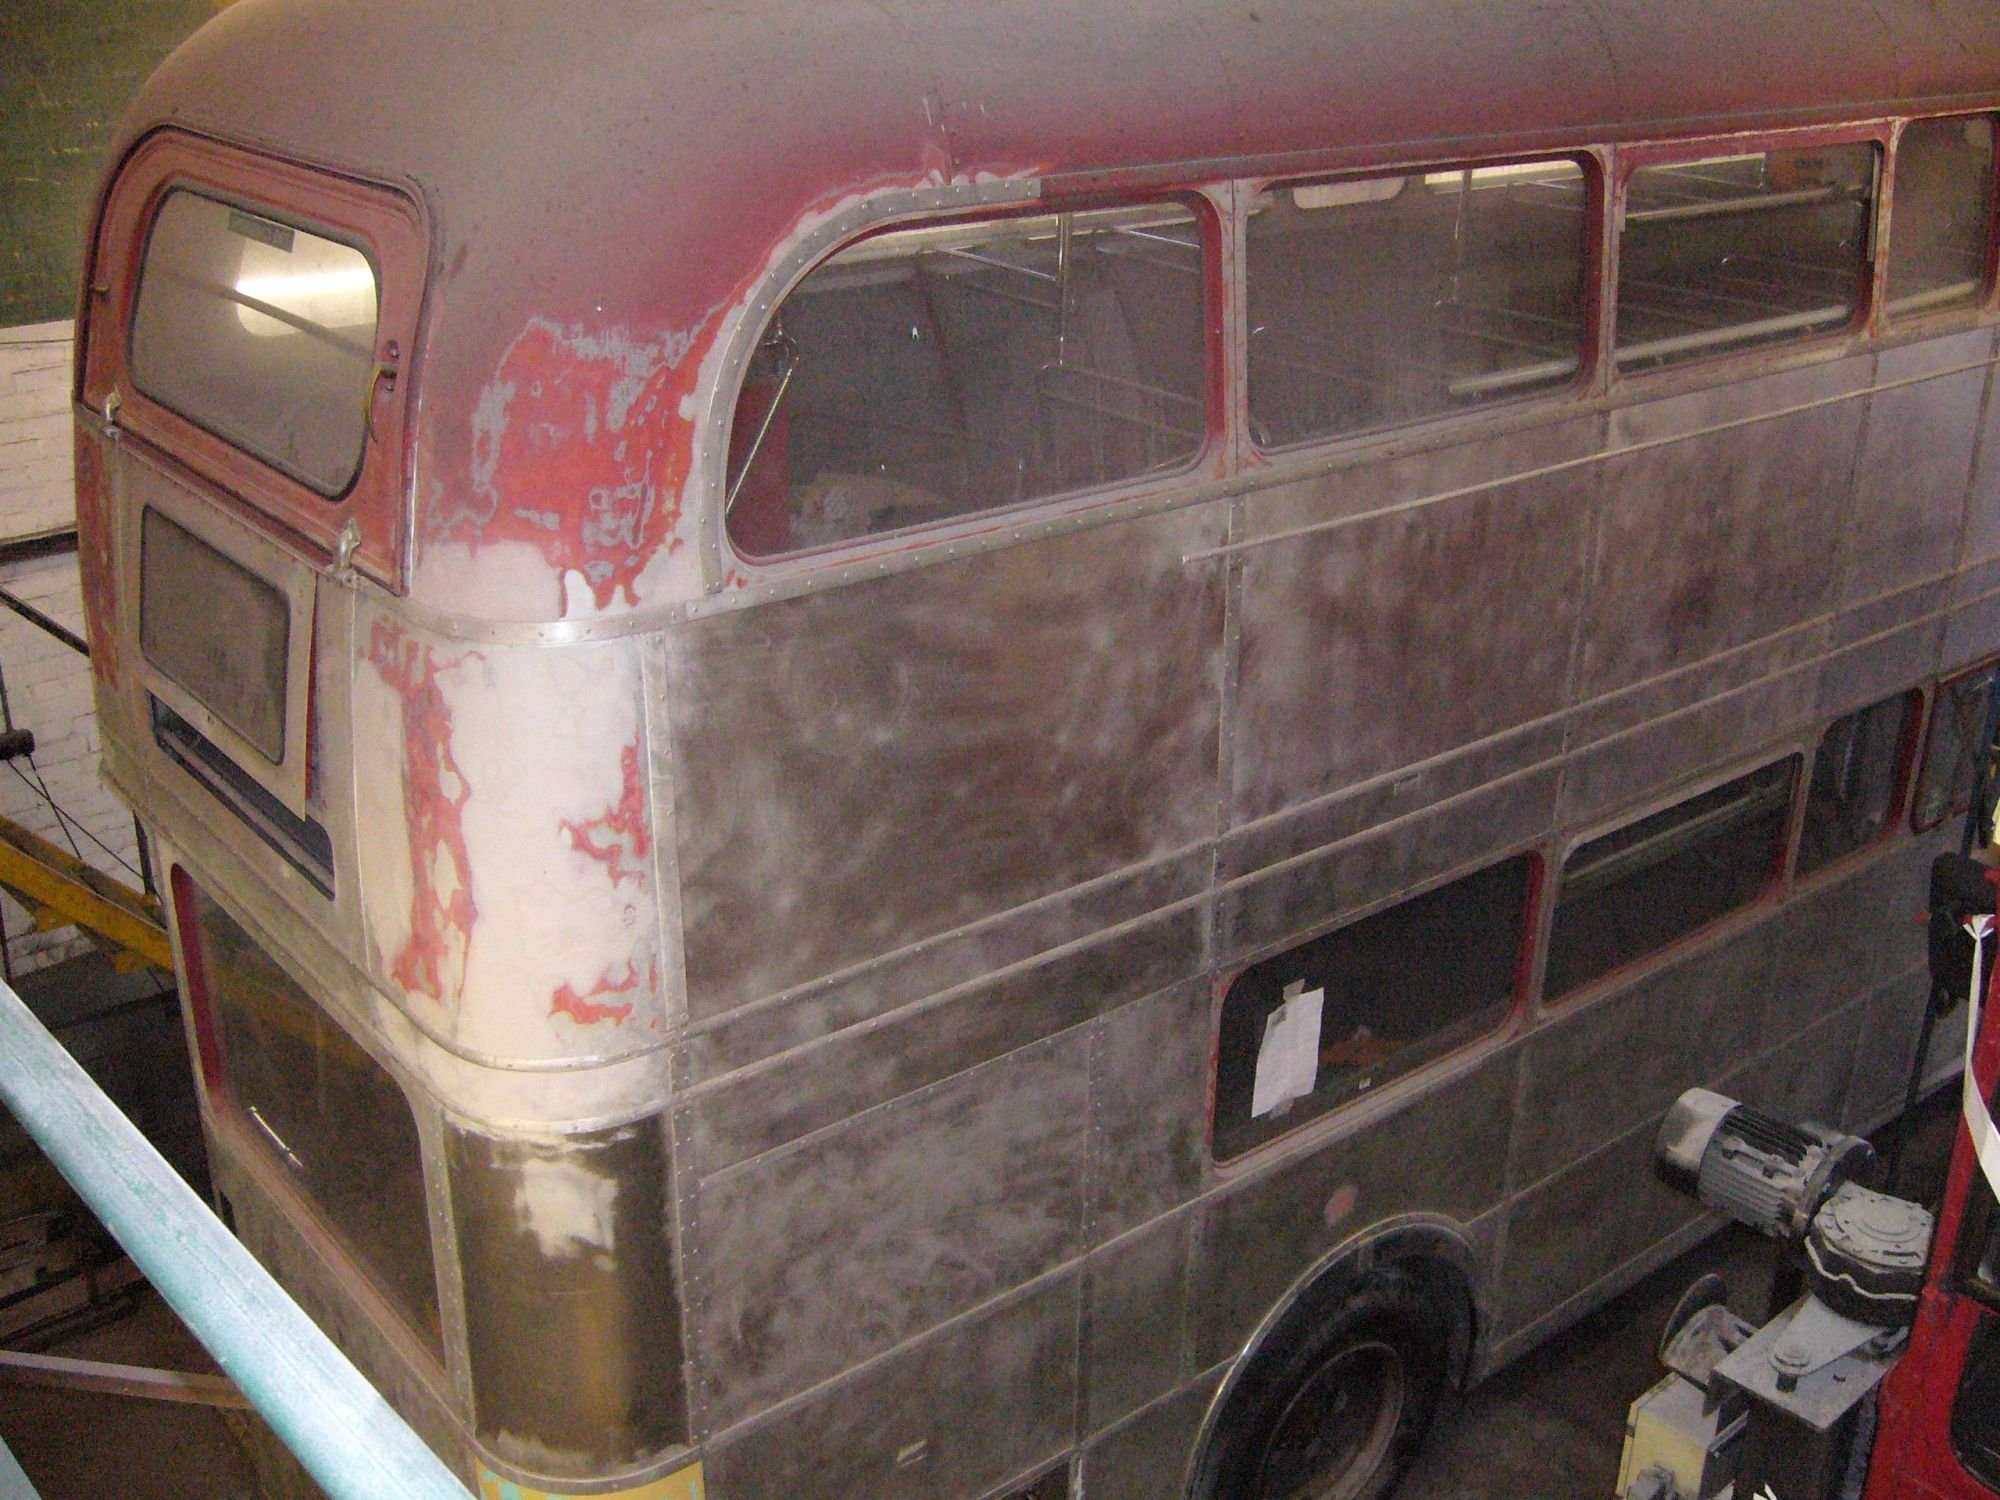 Routemaster Restoration in progress